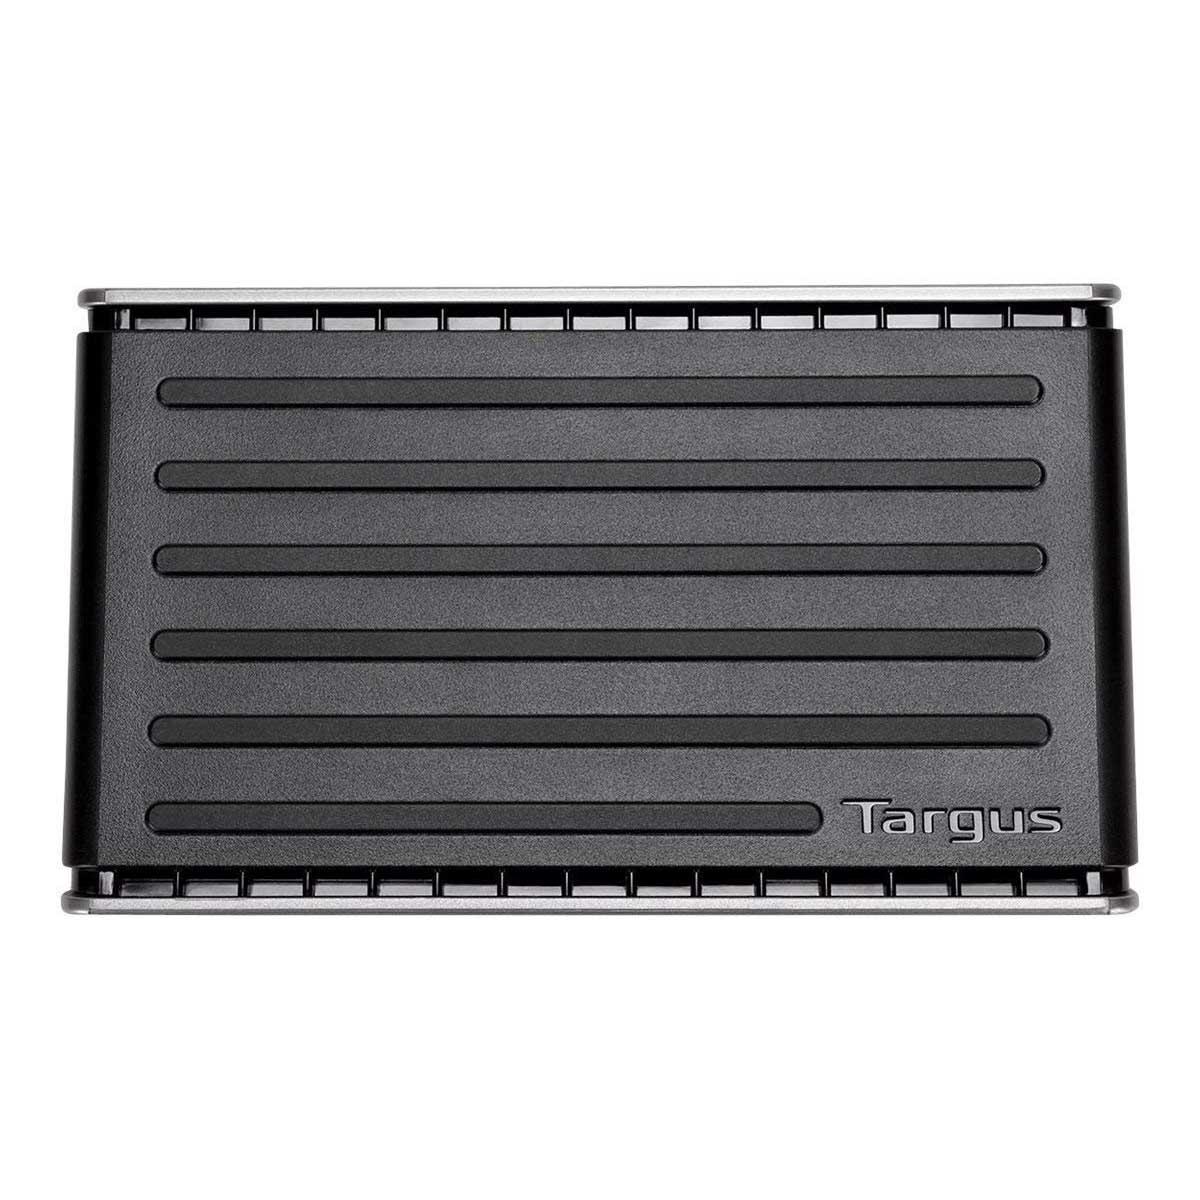 Targus USB-C DV1K-SV4K Docking Station DOCK410EUZ - Black